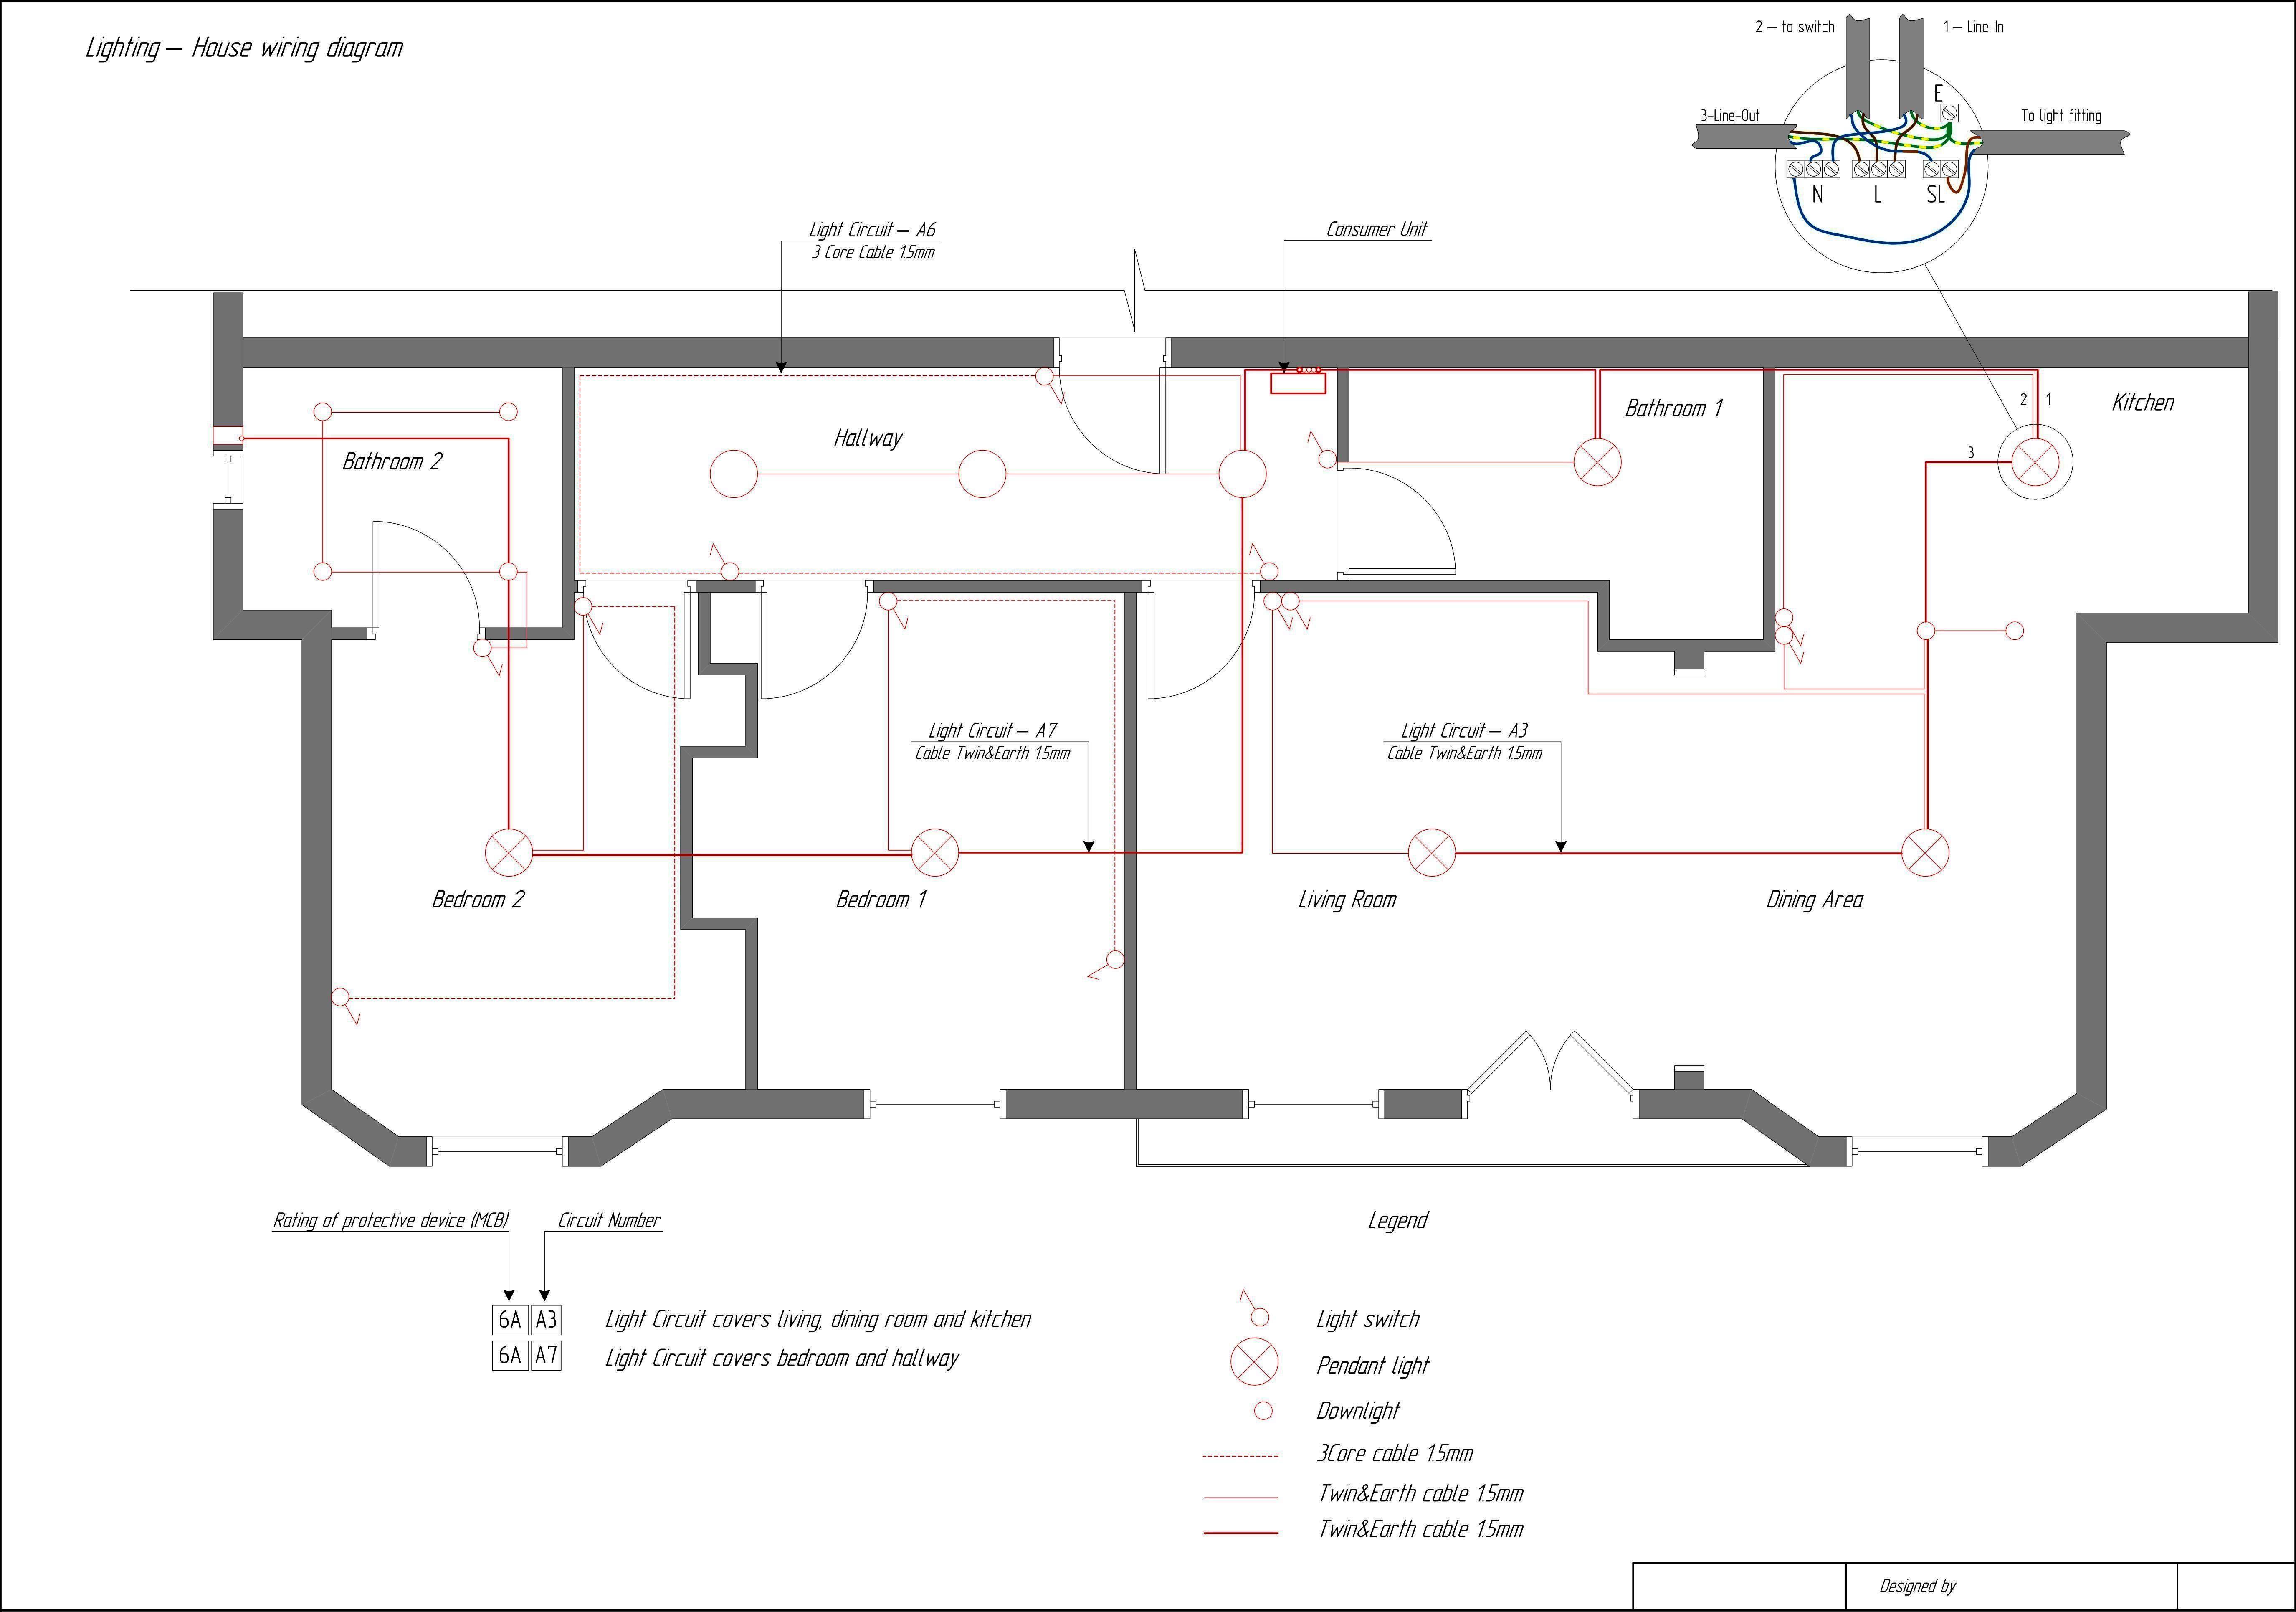 House Wiring Diagram. House. Wiring Diagrams Database